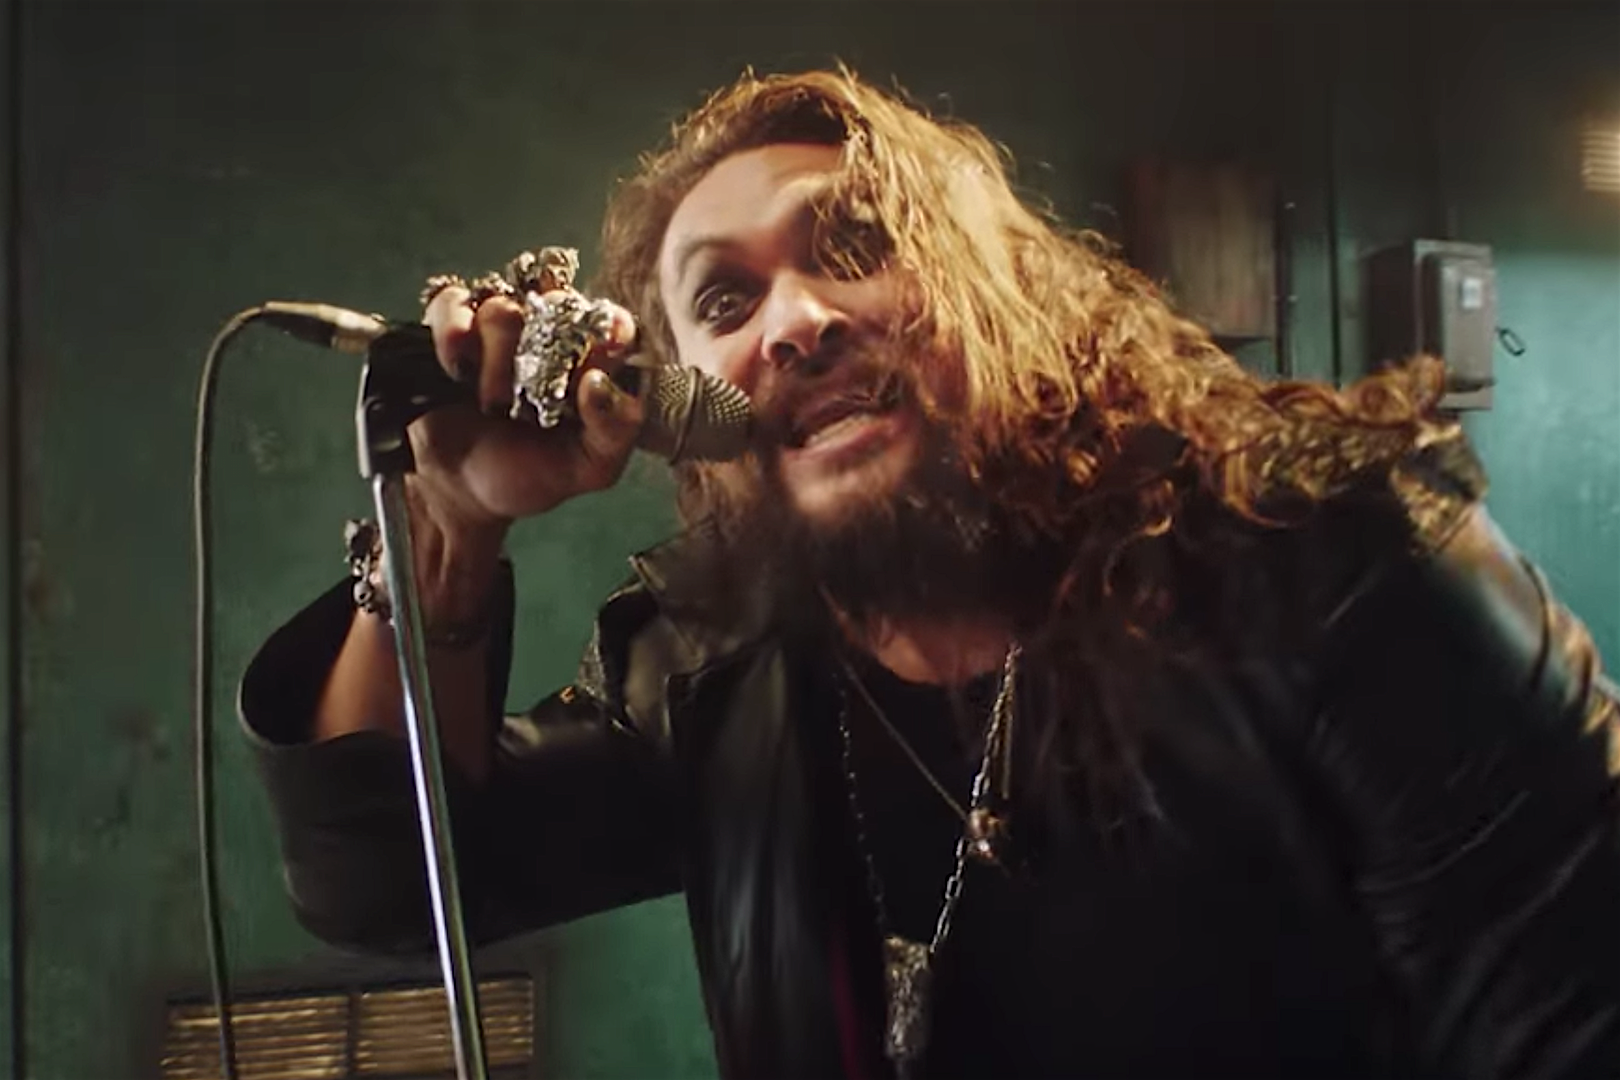 Watch Jason Momoa's Awesome Portrayal of Ozzy Osbourne